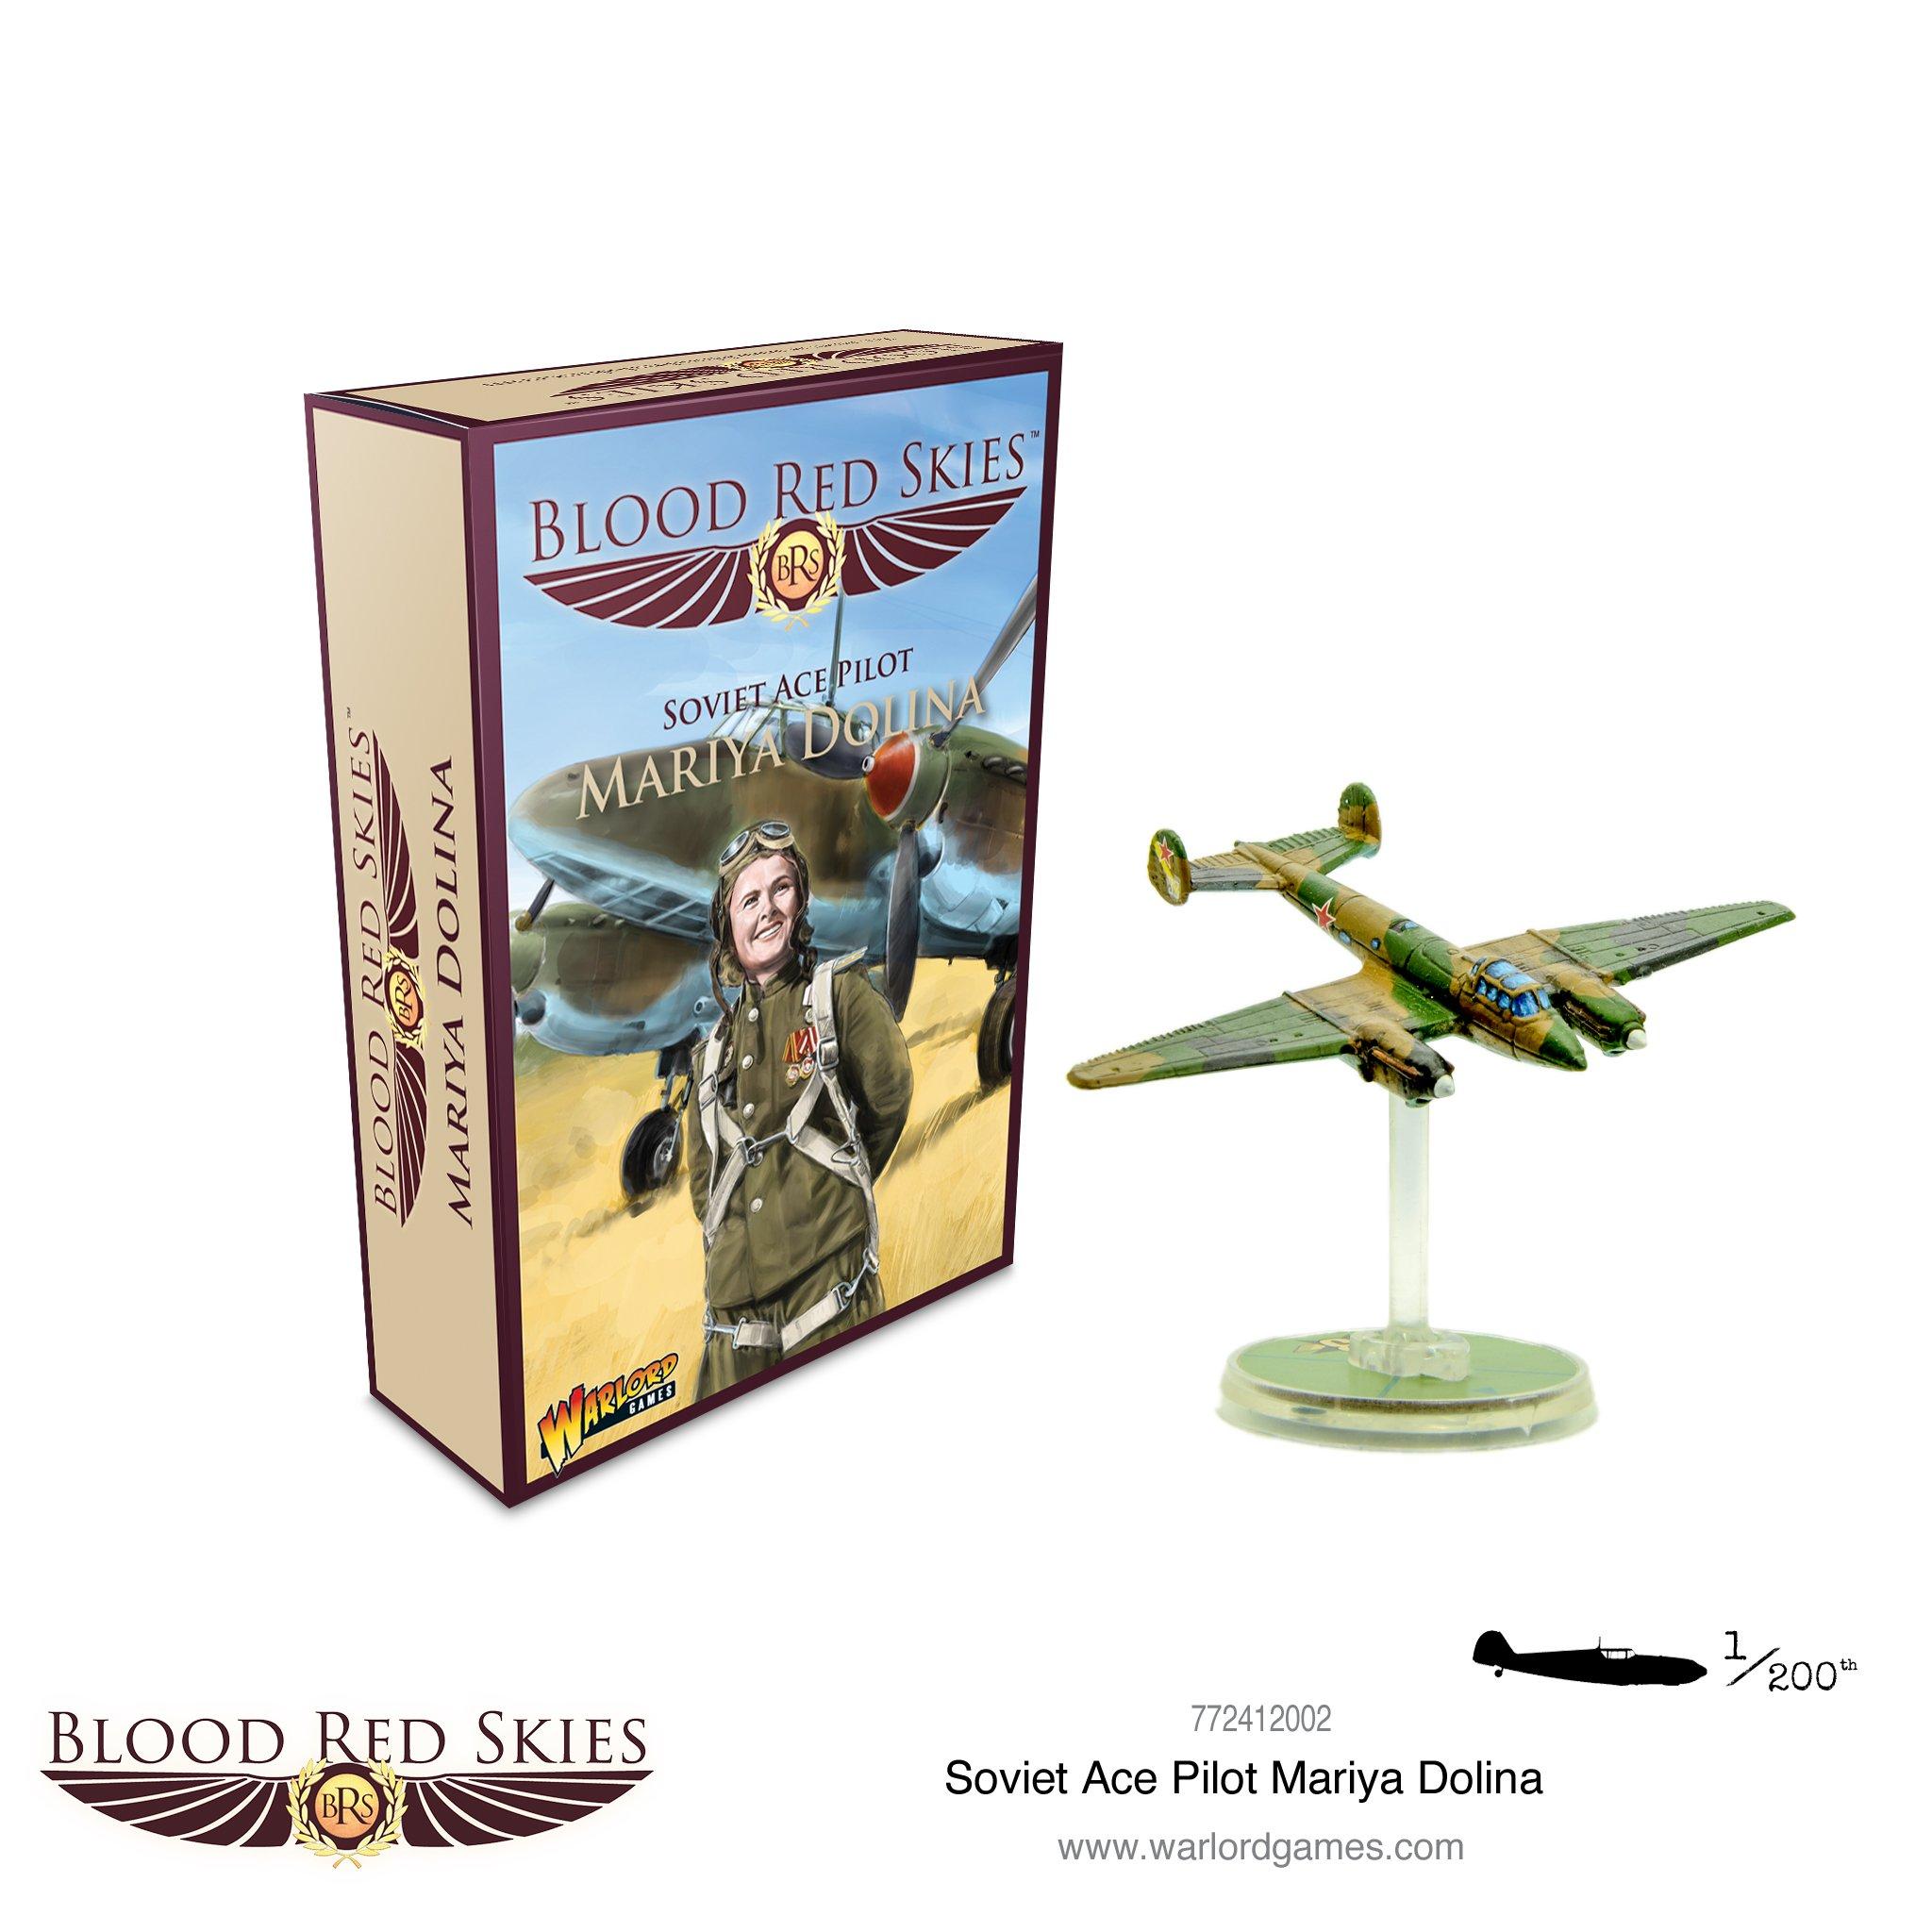 Blood Red Skies Soviet Ace Pilot - Mariya Dolina